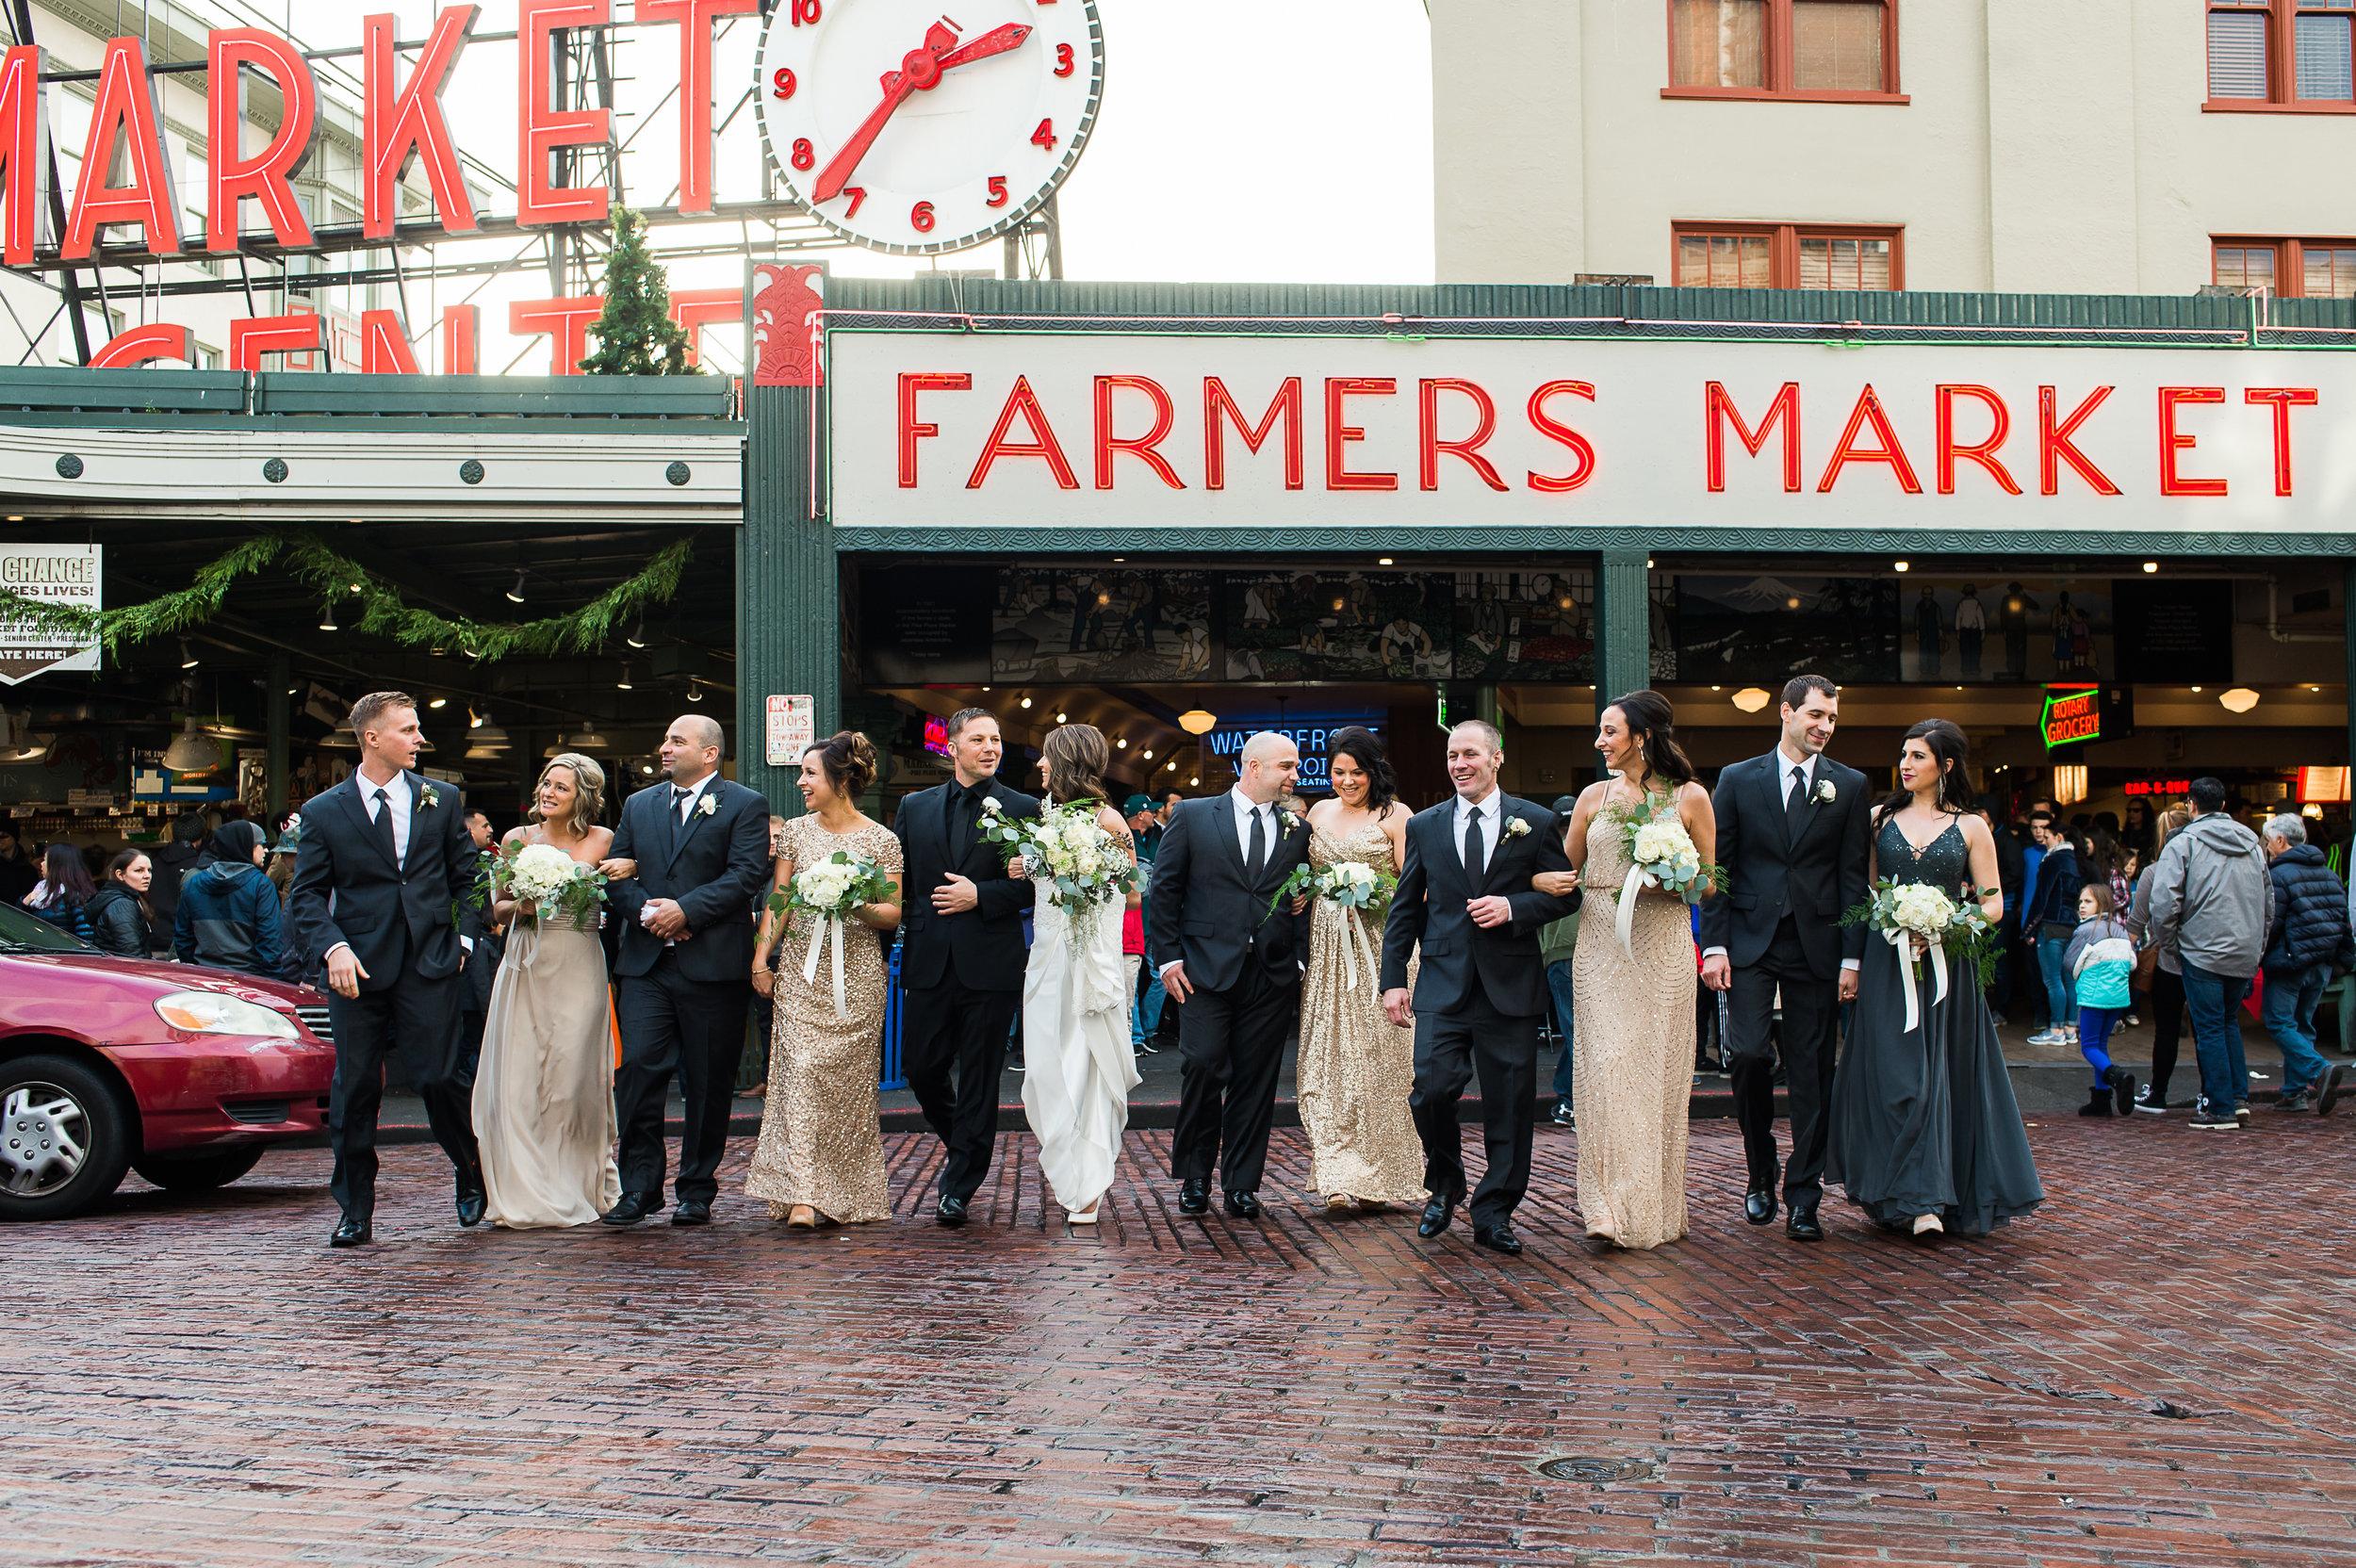 JJ-wedding-Van-Wyhe-Photography-151.jpg